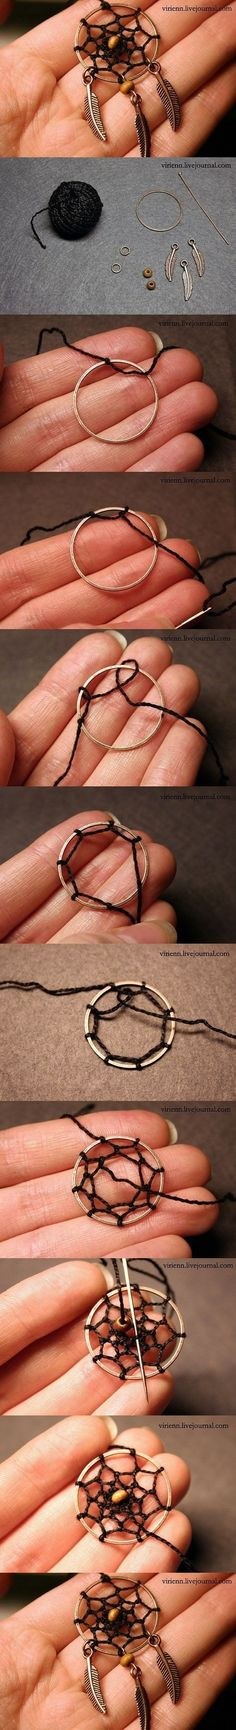 DIY Dream Catcher Pendant | www.FabArtDIY.com LIKE Us on Facebook ==> www.facebook.com/... #diy